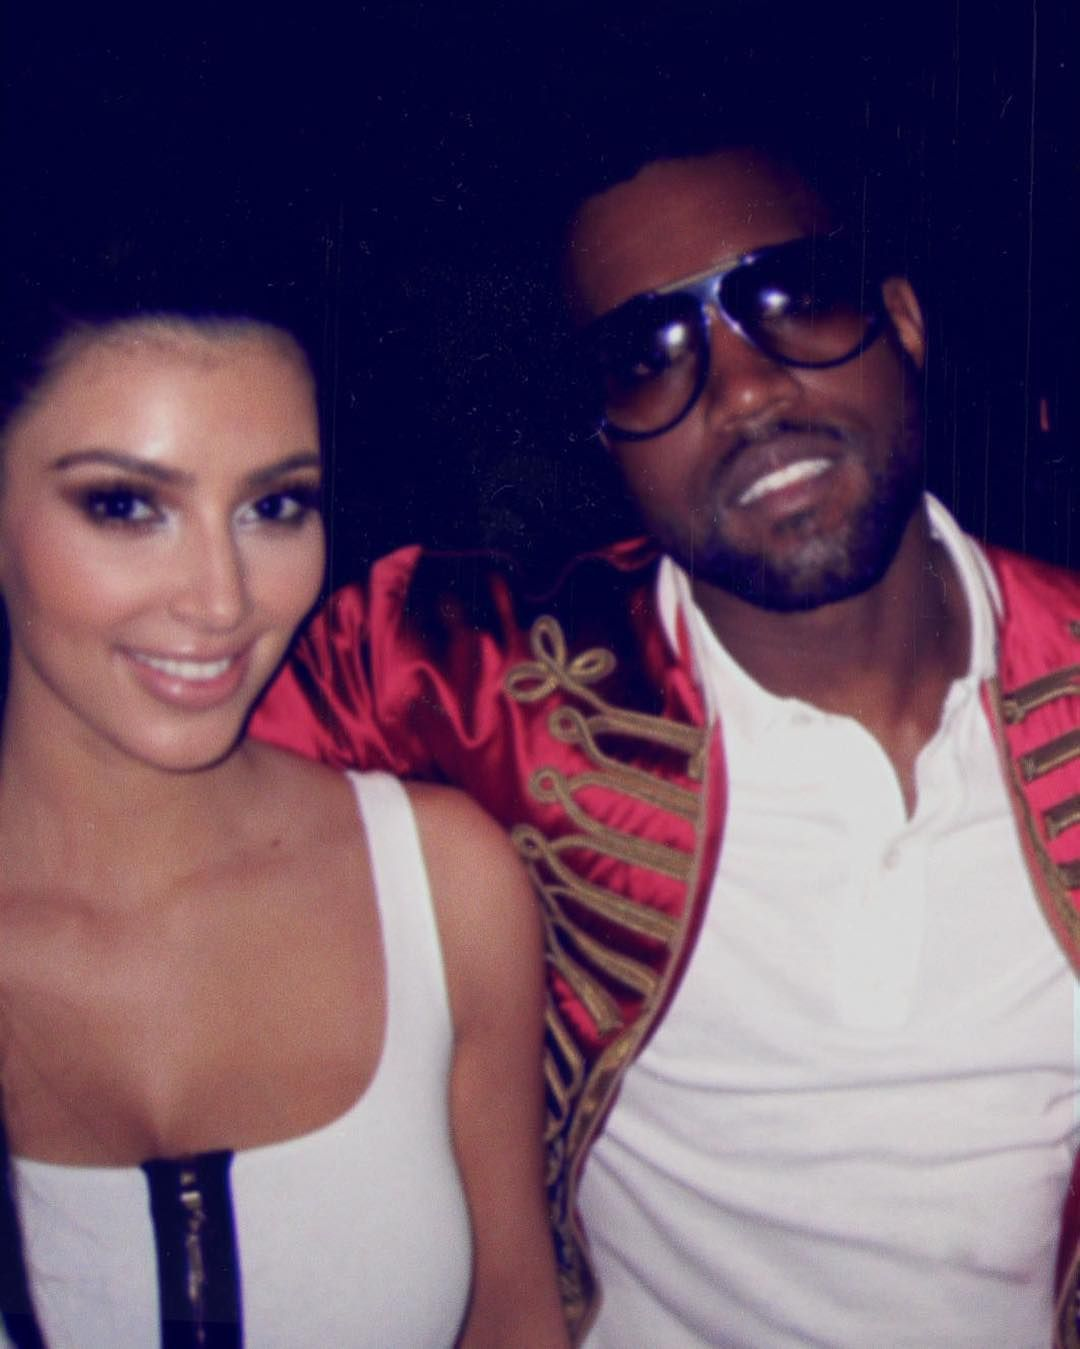 2009 Maybe 2008 I Can T Remember Kim Kardashian Kanye West Kim And Kanye Kim Kardashian